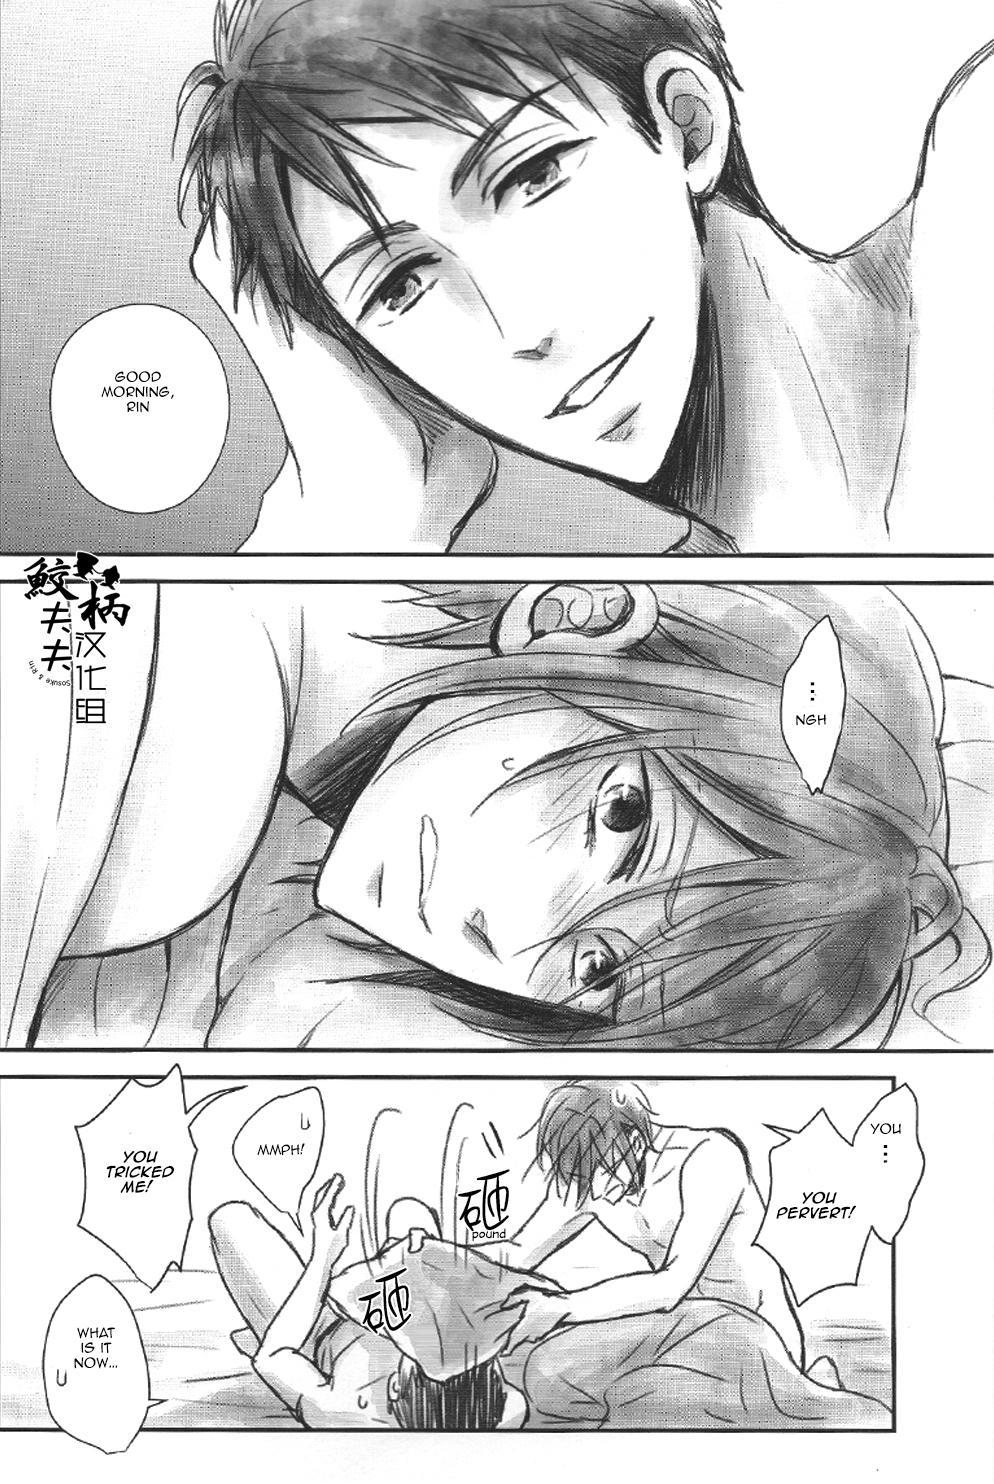 (Renai Jaws 4) [Lionni (Saaya)] 2-gatsu 2-ka no Hajimete | February Second for the First Time (Free!) [English] [Carrot-Bunny] 2